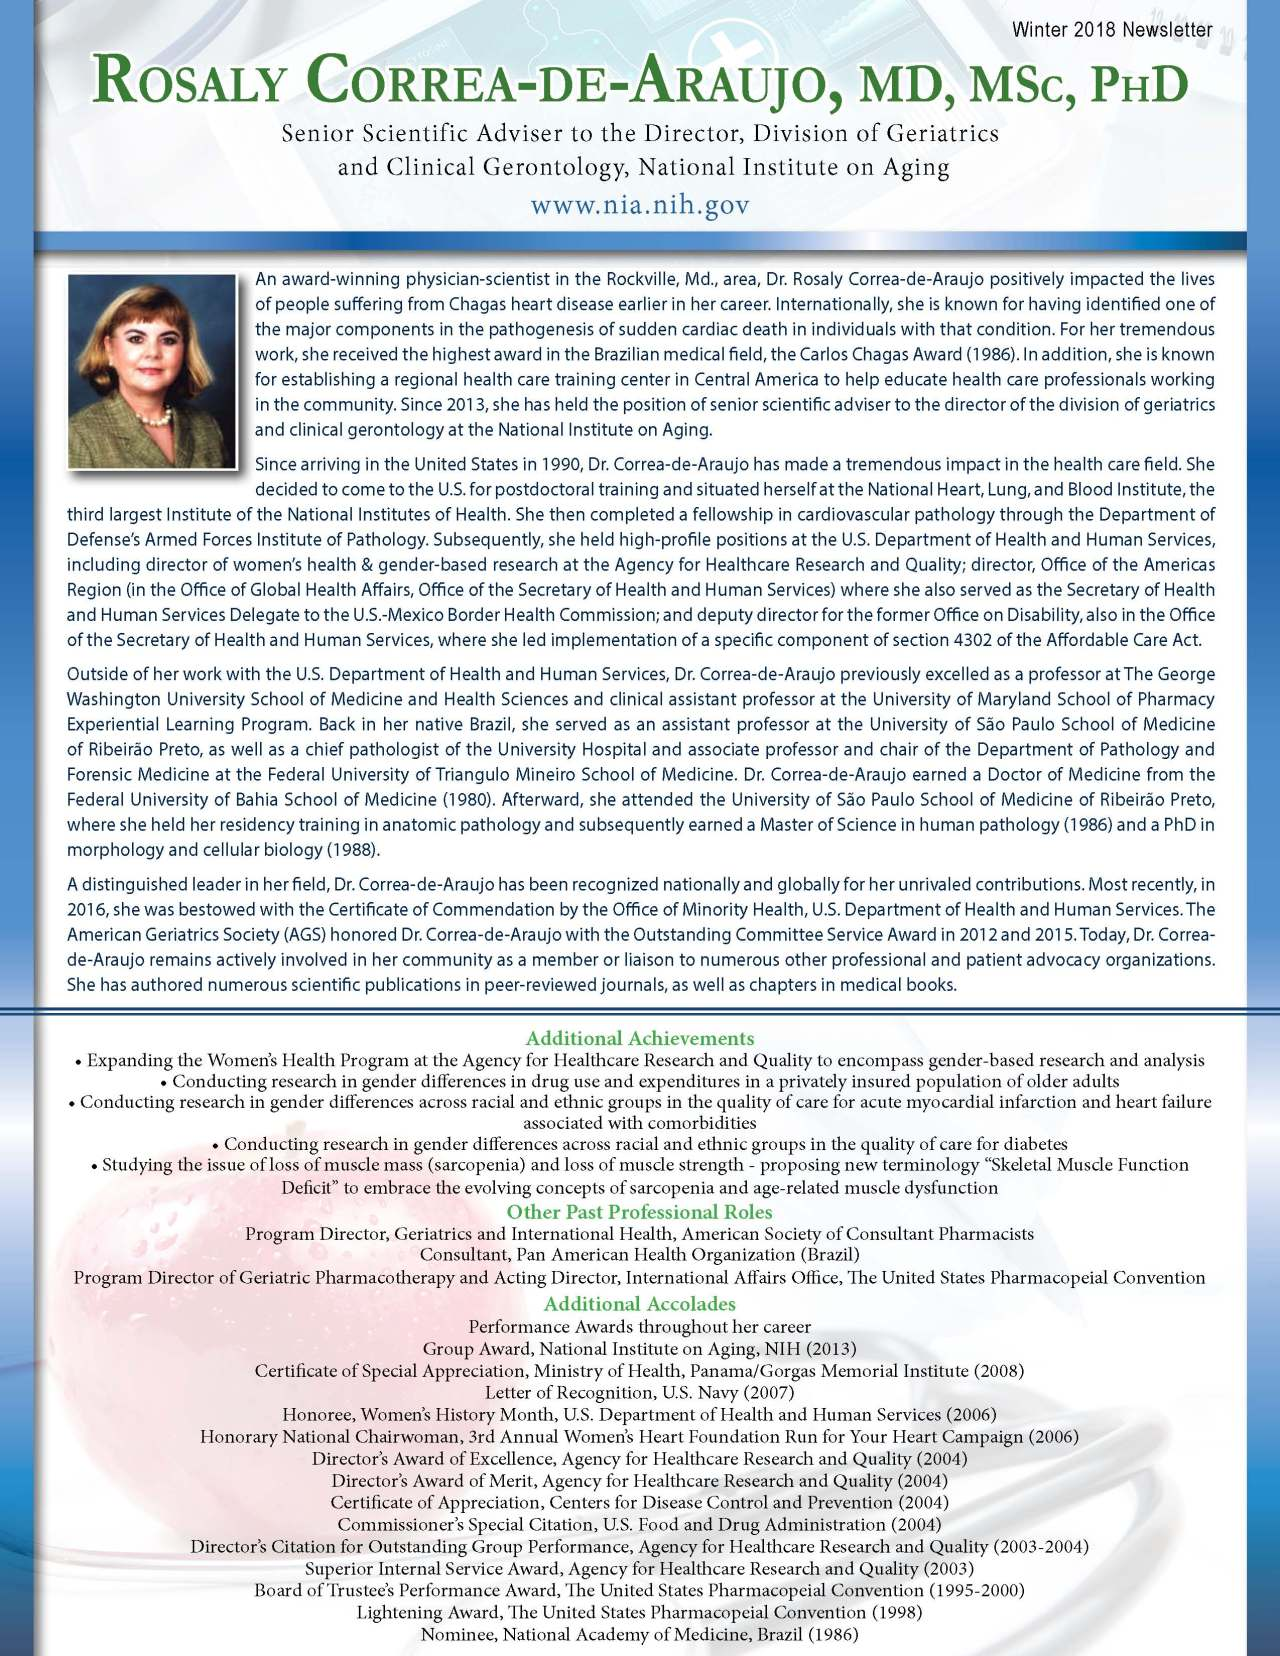 Correa-de-Araujo, Rosaly 3698888_31759959 Newsletter REVISED